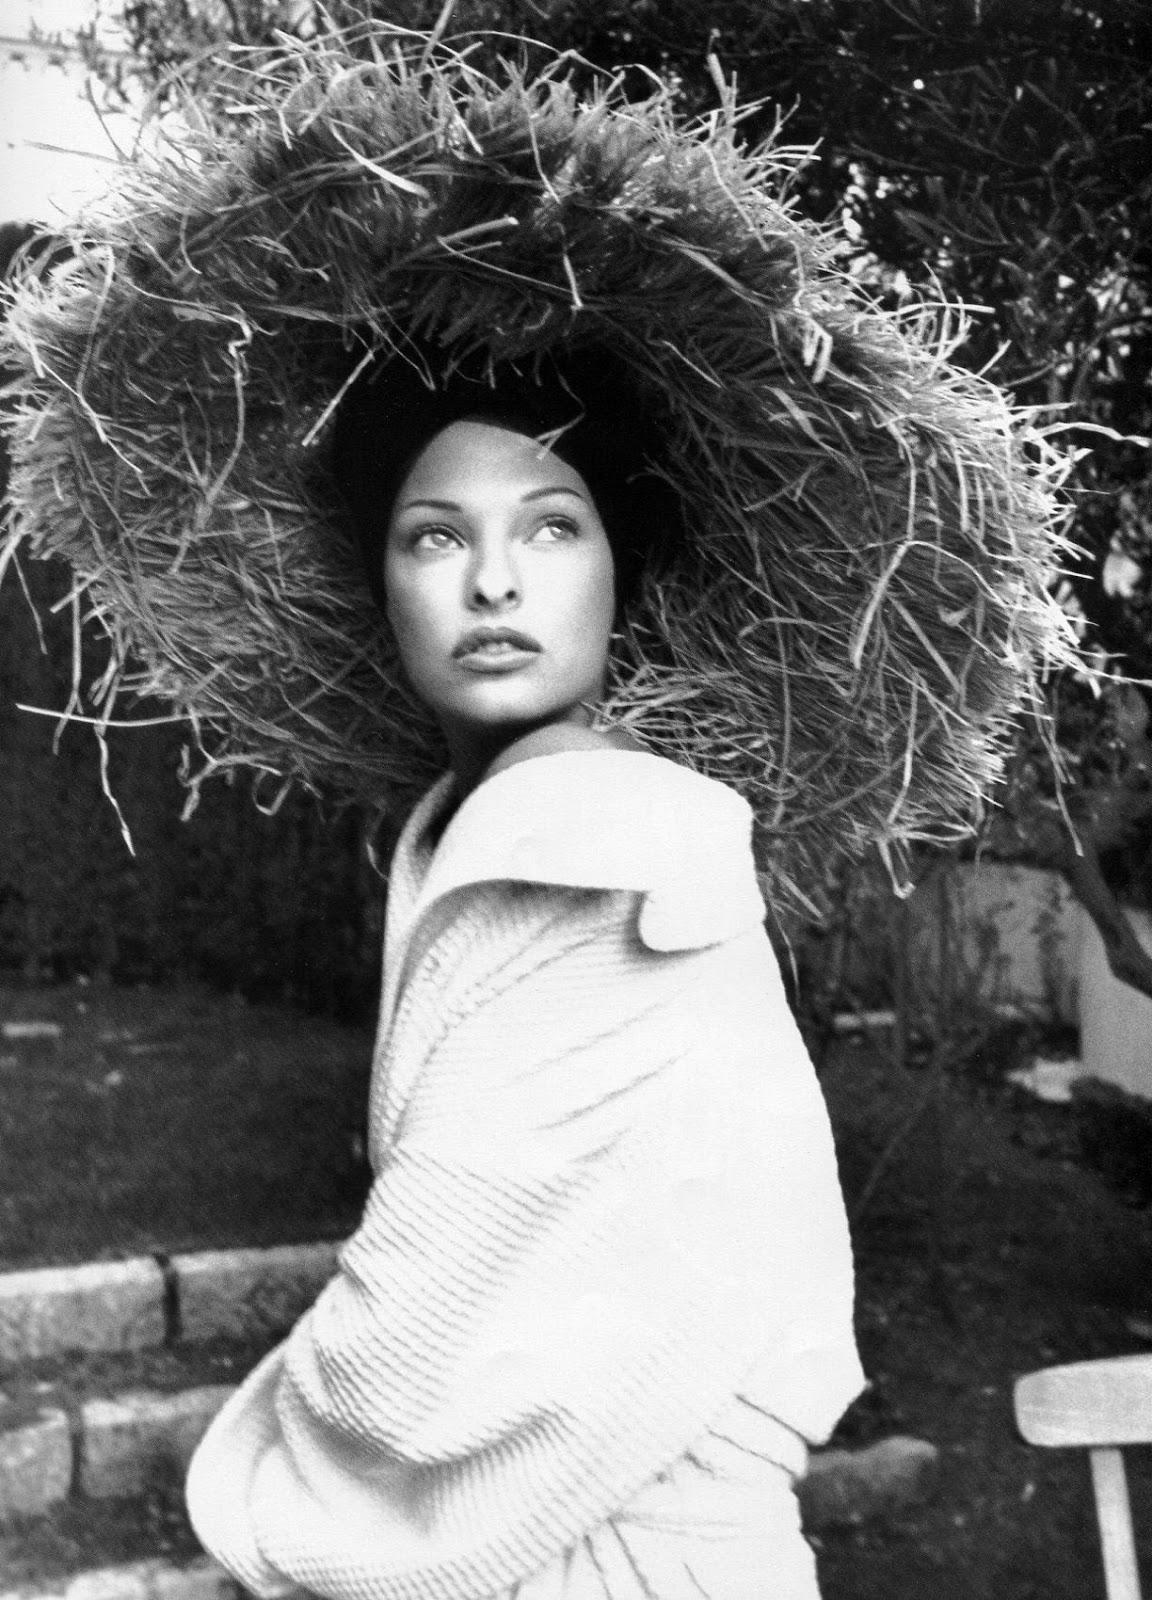 http://3.bp.blogspot.com/-E2k56NsN1Yc/ULY4Ddzv8TI/AAAAAAAALTI/XrYaCEAJcdM/s1600/Linda+Evangelista+1993+02+Vogue+Paris+Ph+Karl+Lagerfeld+005.jpg